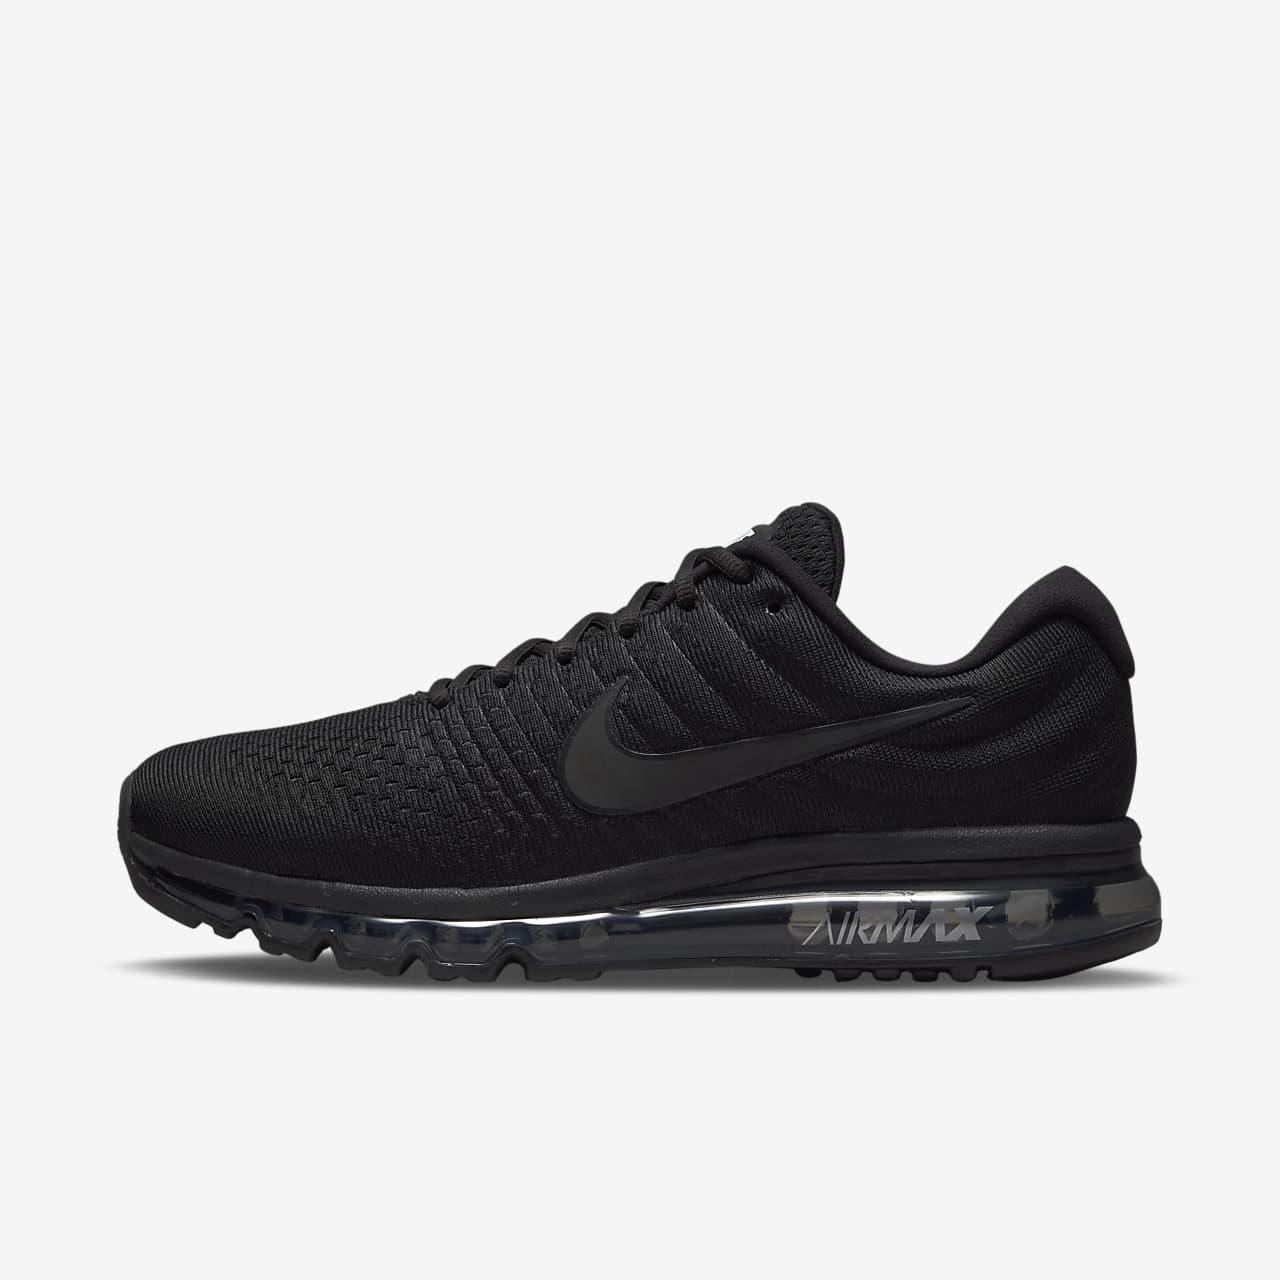 sports shoes 4ee29 759ad ... Calzado para hombre Nike Air Max 2017